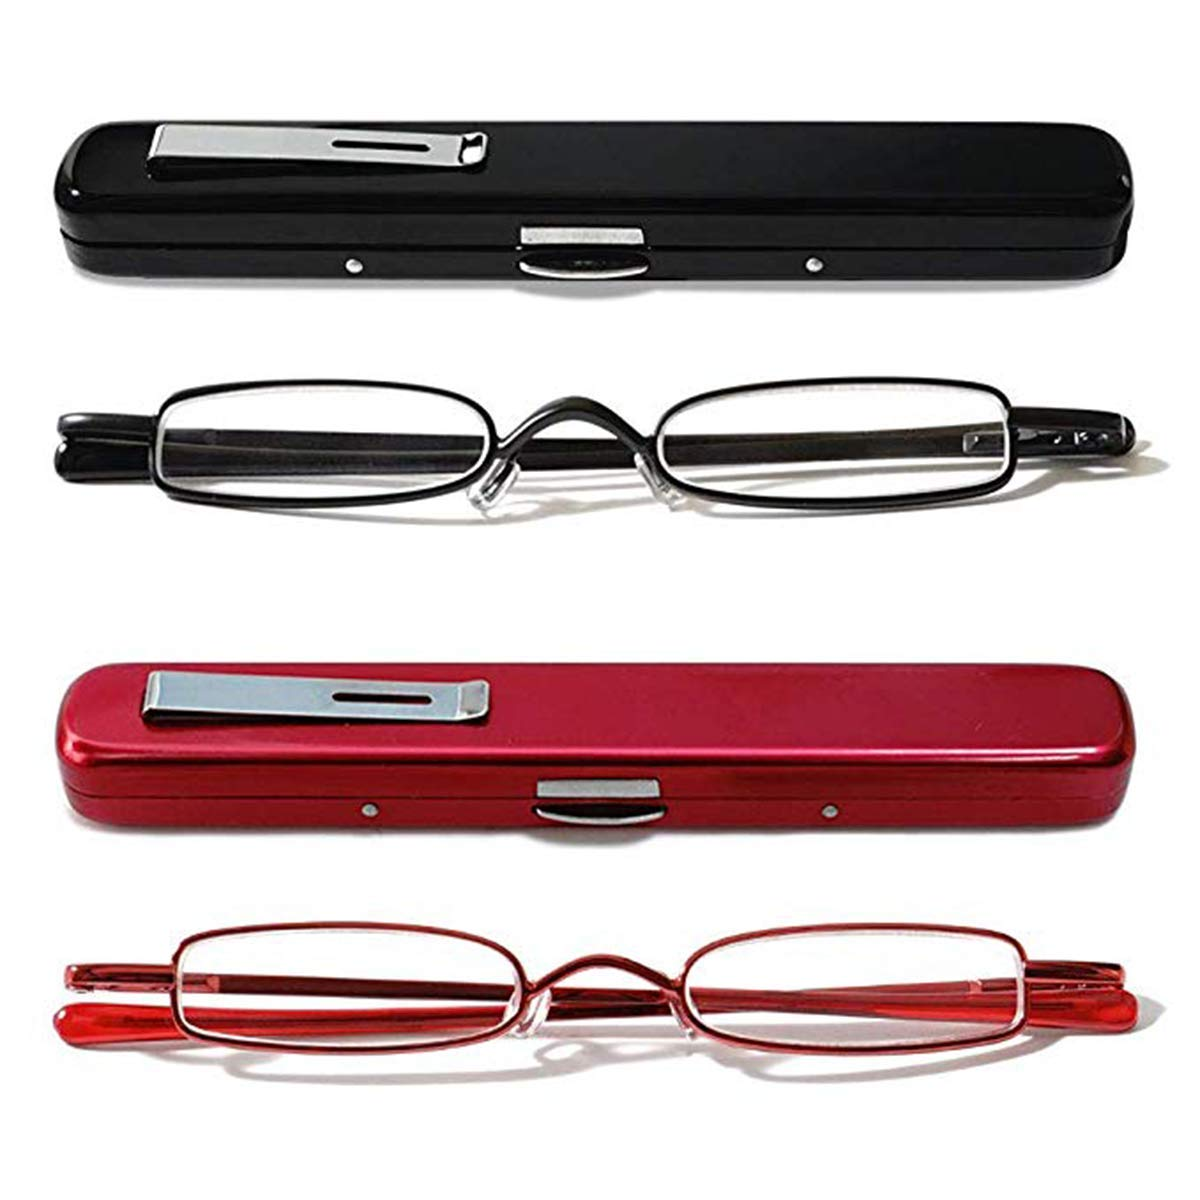 KoKoBin Mini Reading Glasses - 2 Pairs Metal Frame Readers with Spring Hinge Portable Pen Clip for Men Women,Black+red 2.5 Strength